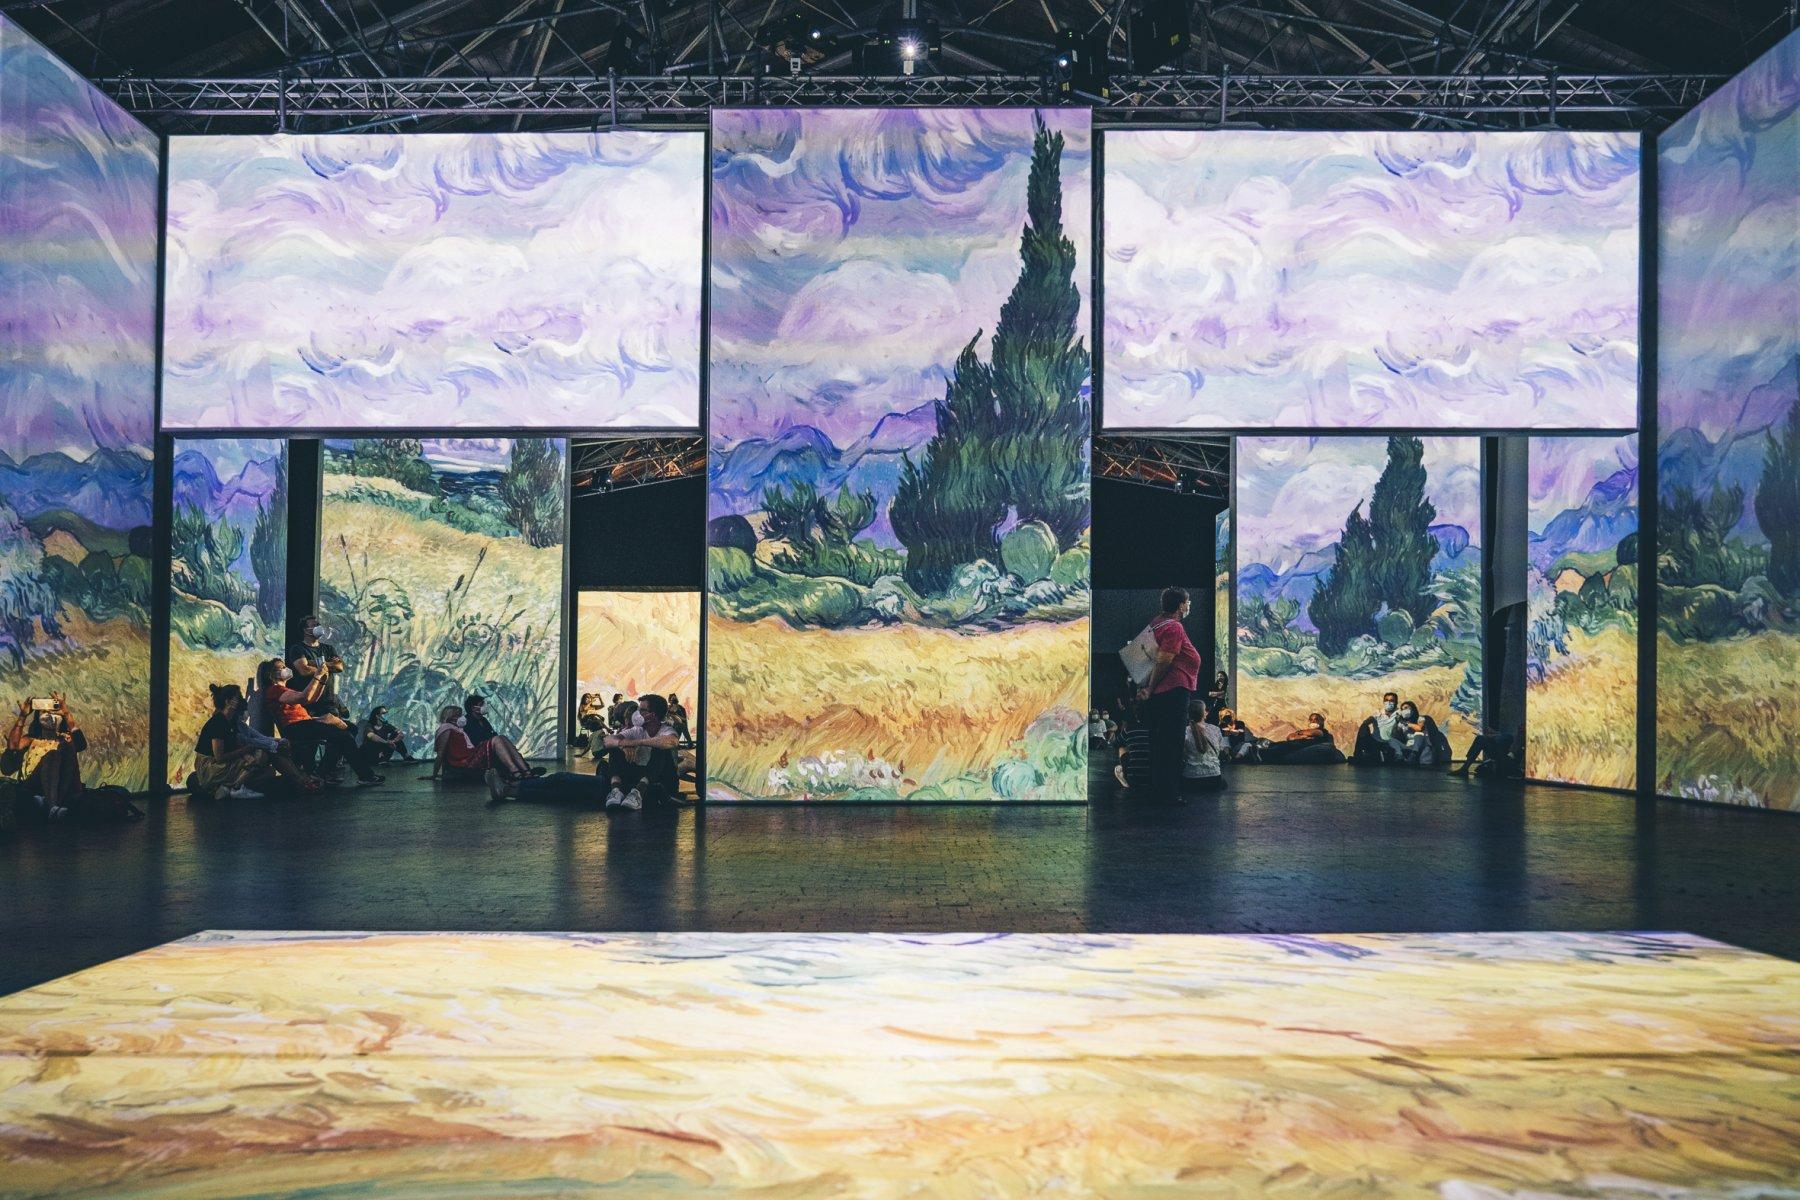 Van Gogh Alive 6270 – ©wunderland media GmbH